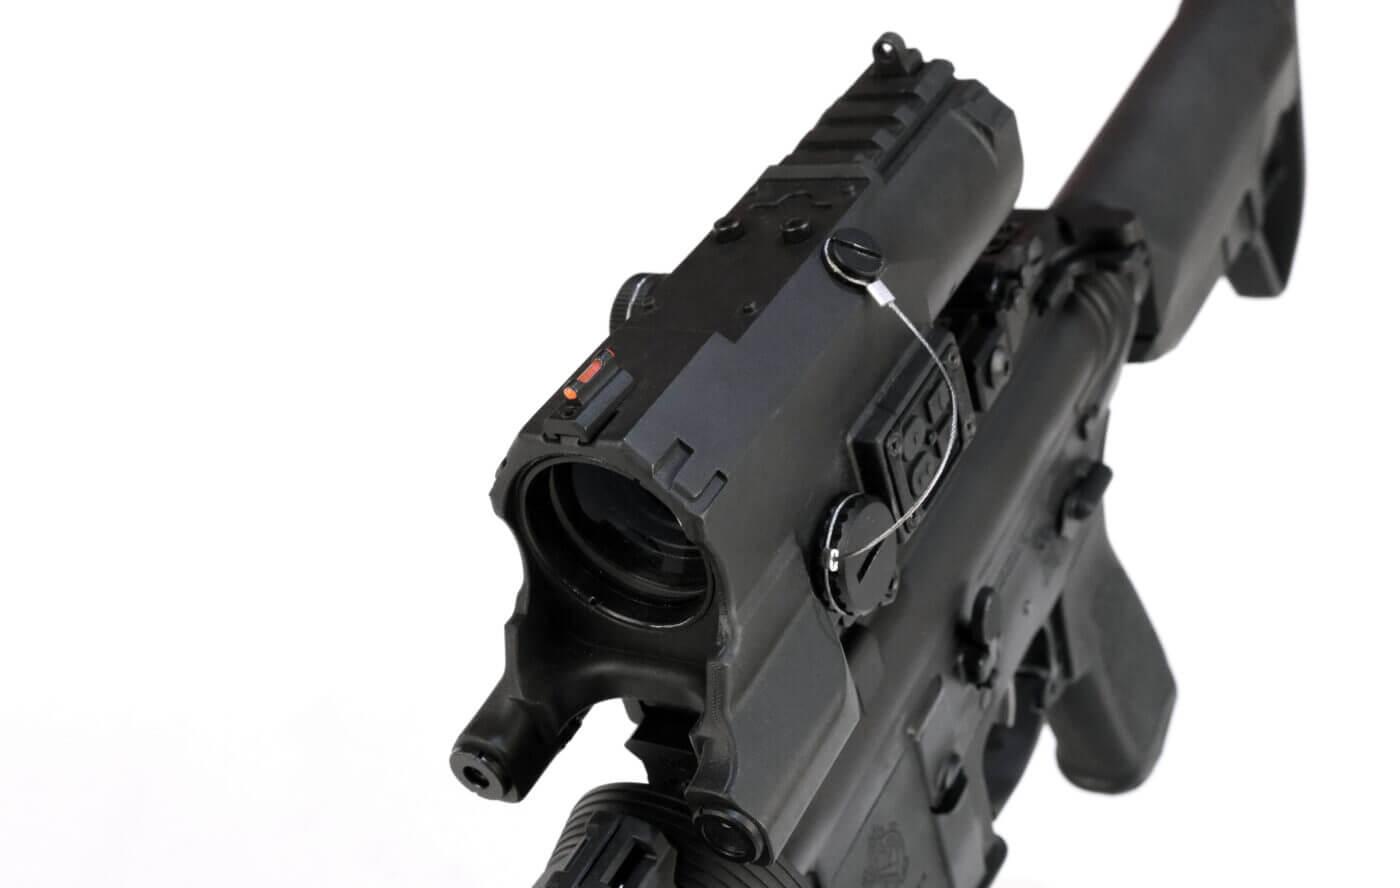 NcSTAR VISM ECO MOD2 mounted on a rifle